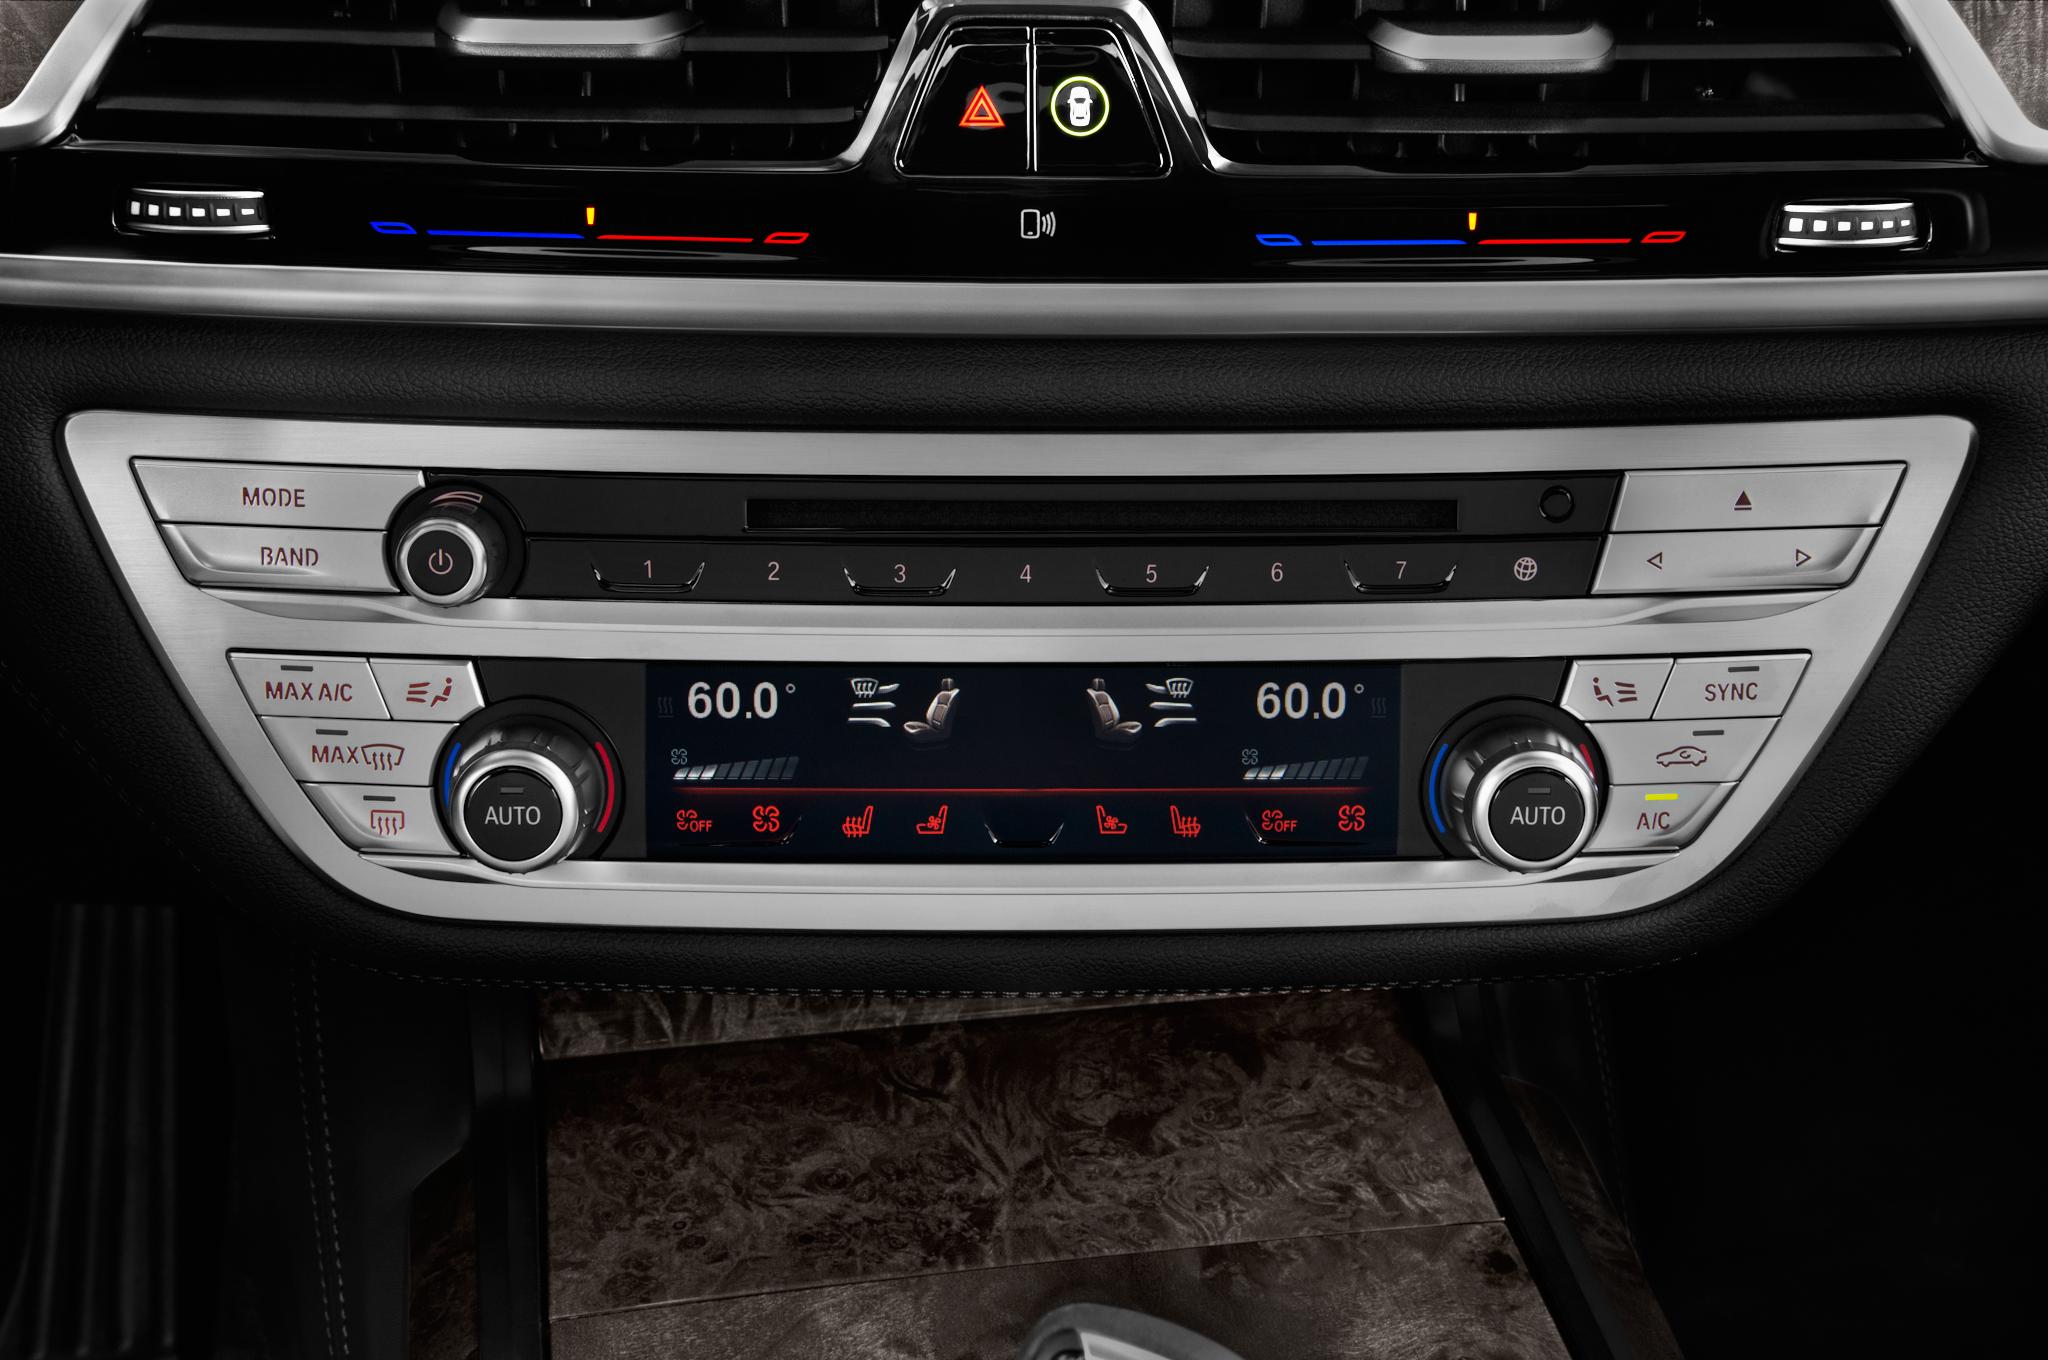 2017 BMW Alpina B7 xDrive is a 600 HP 193 MPH Luxury Sedan #09217E